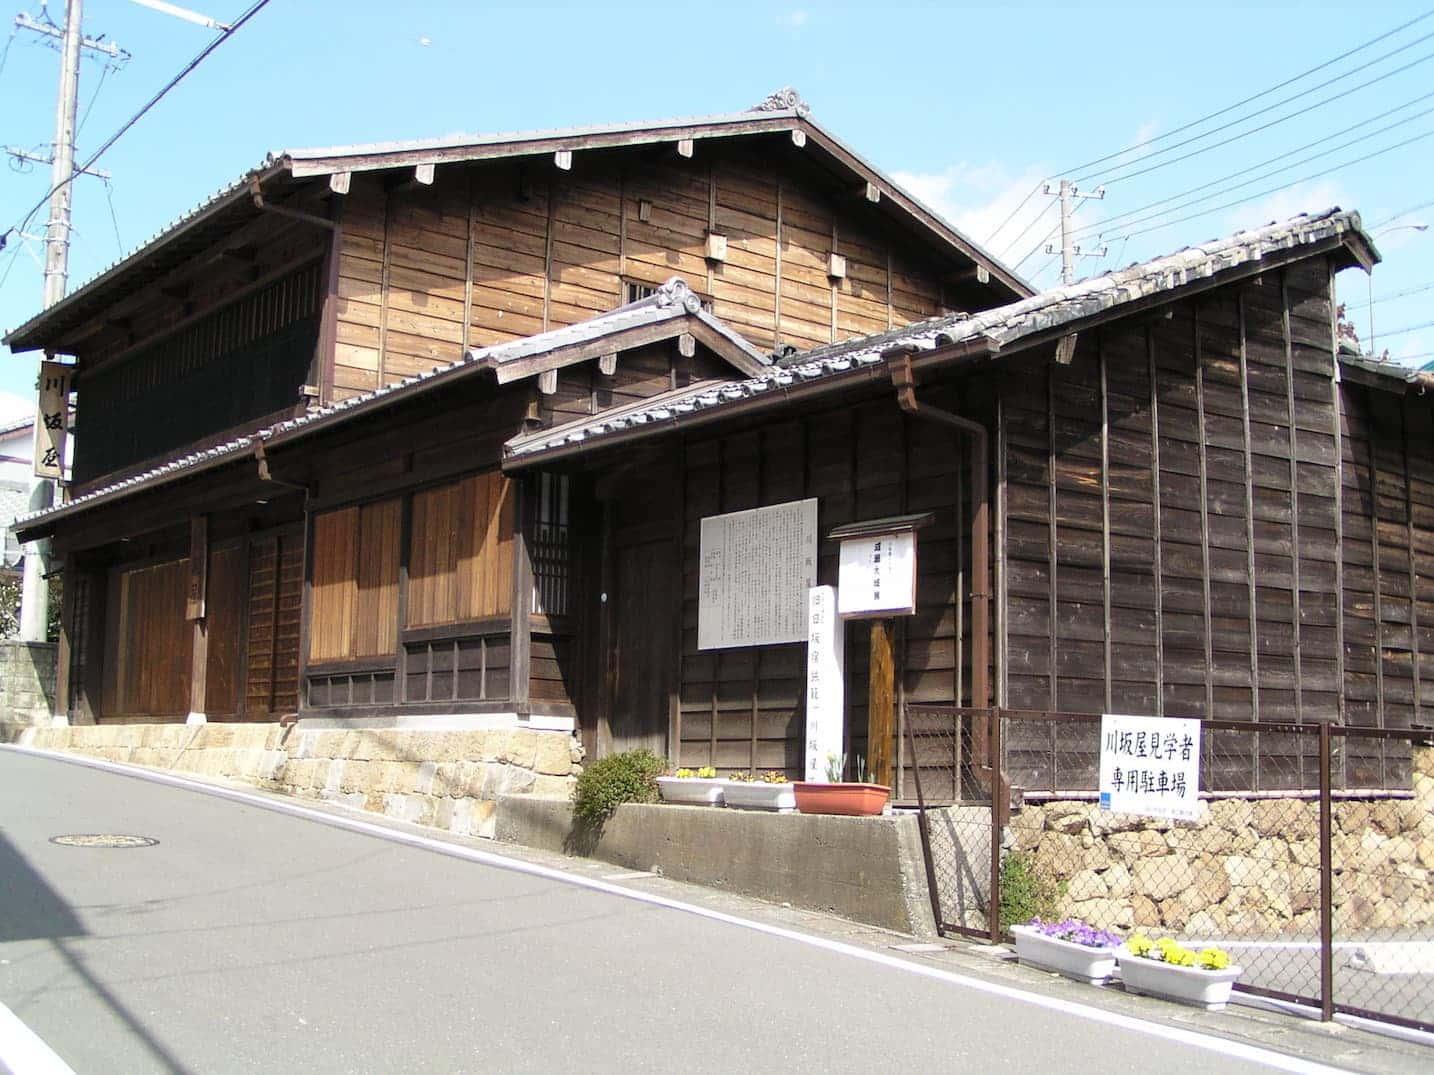 Thị trấn Tokaido Post-Station